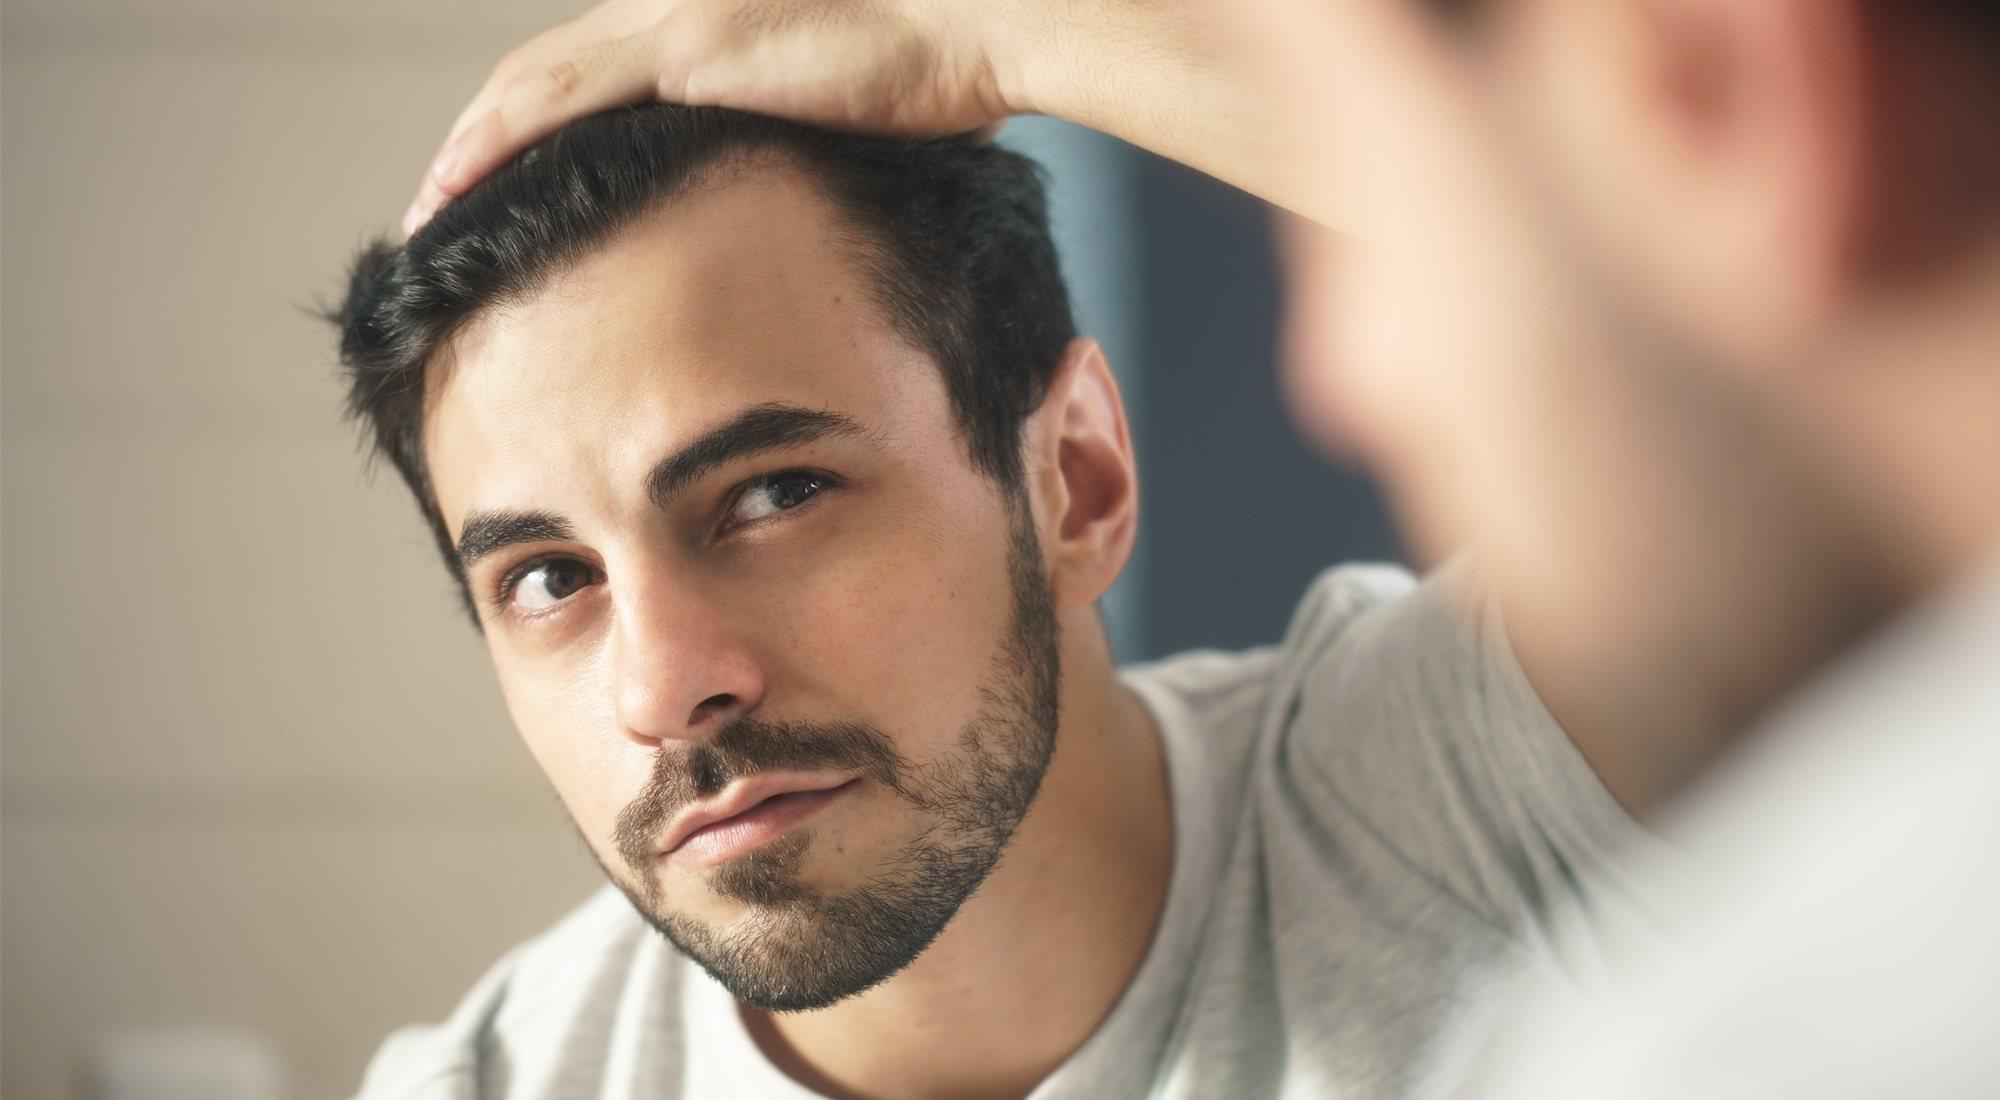 Alopecia herencia